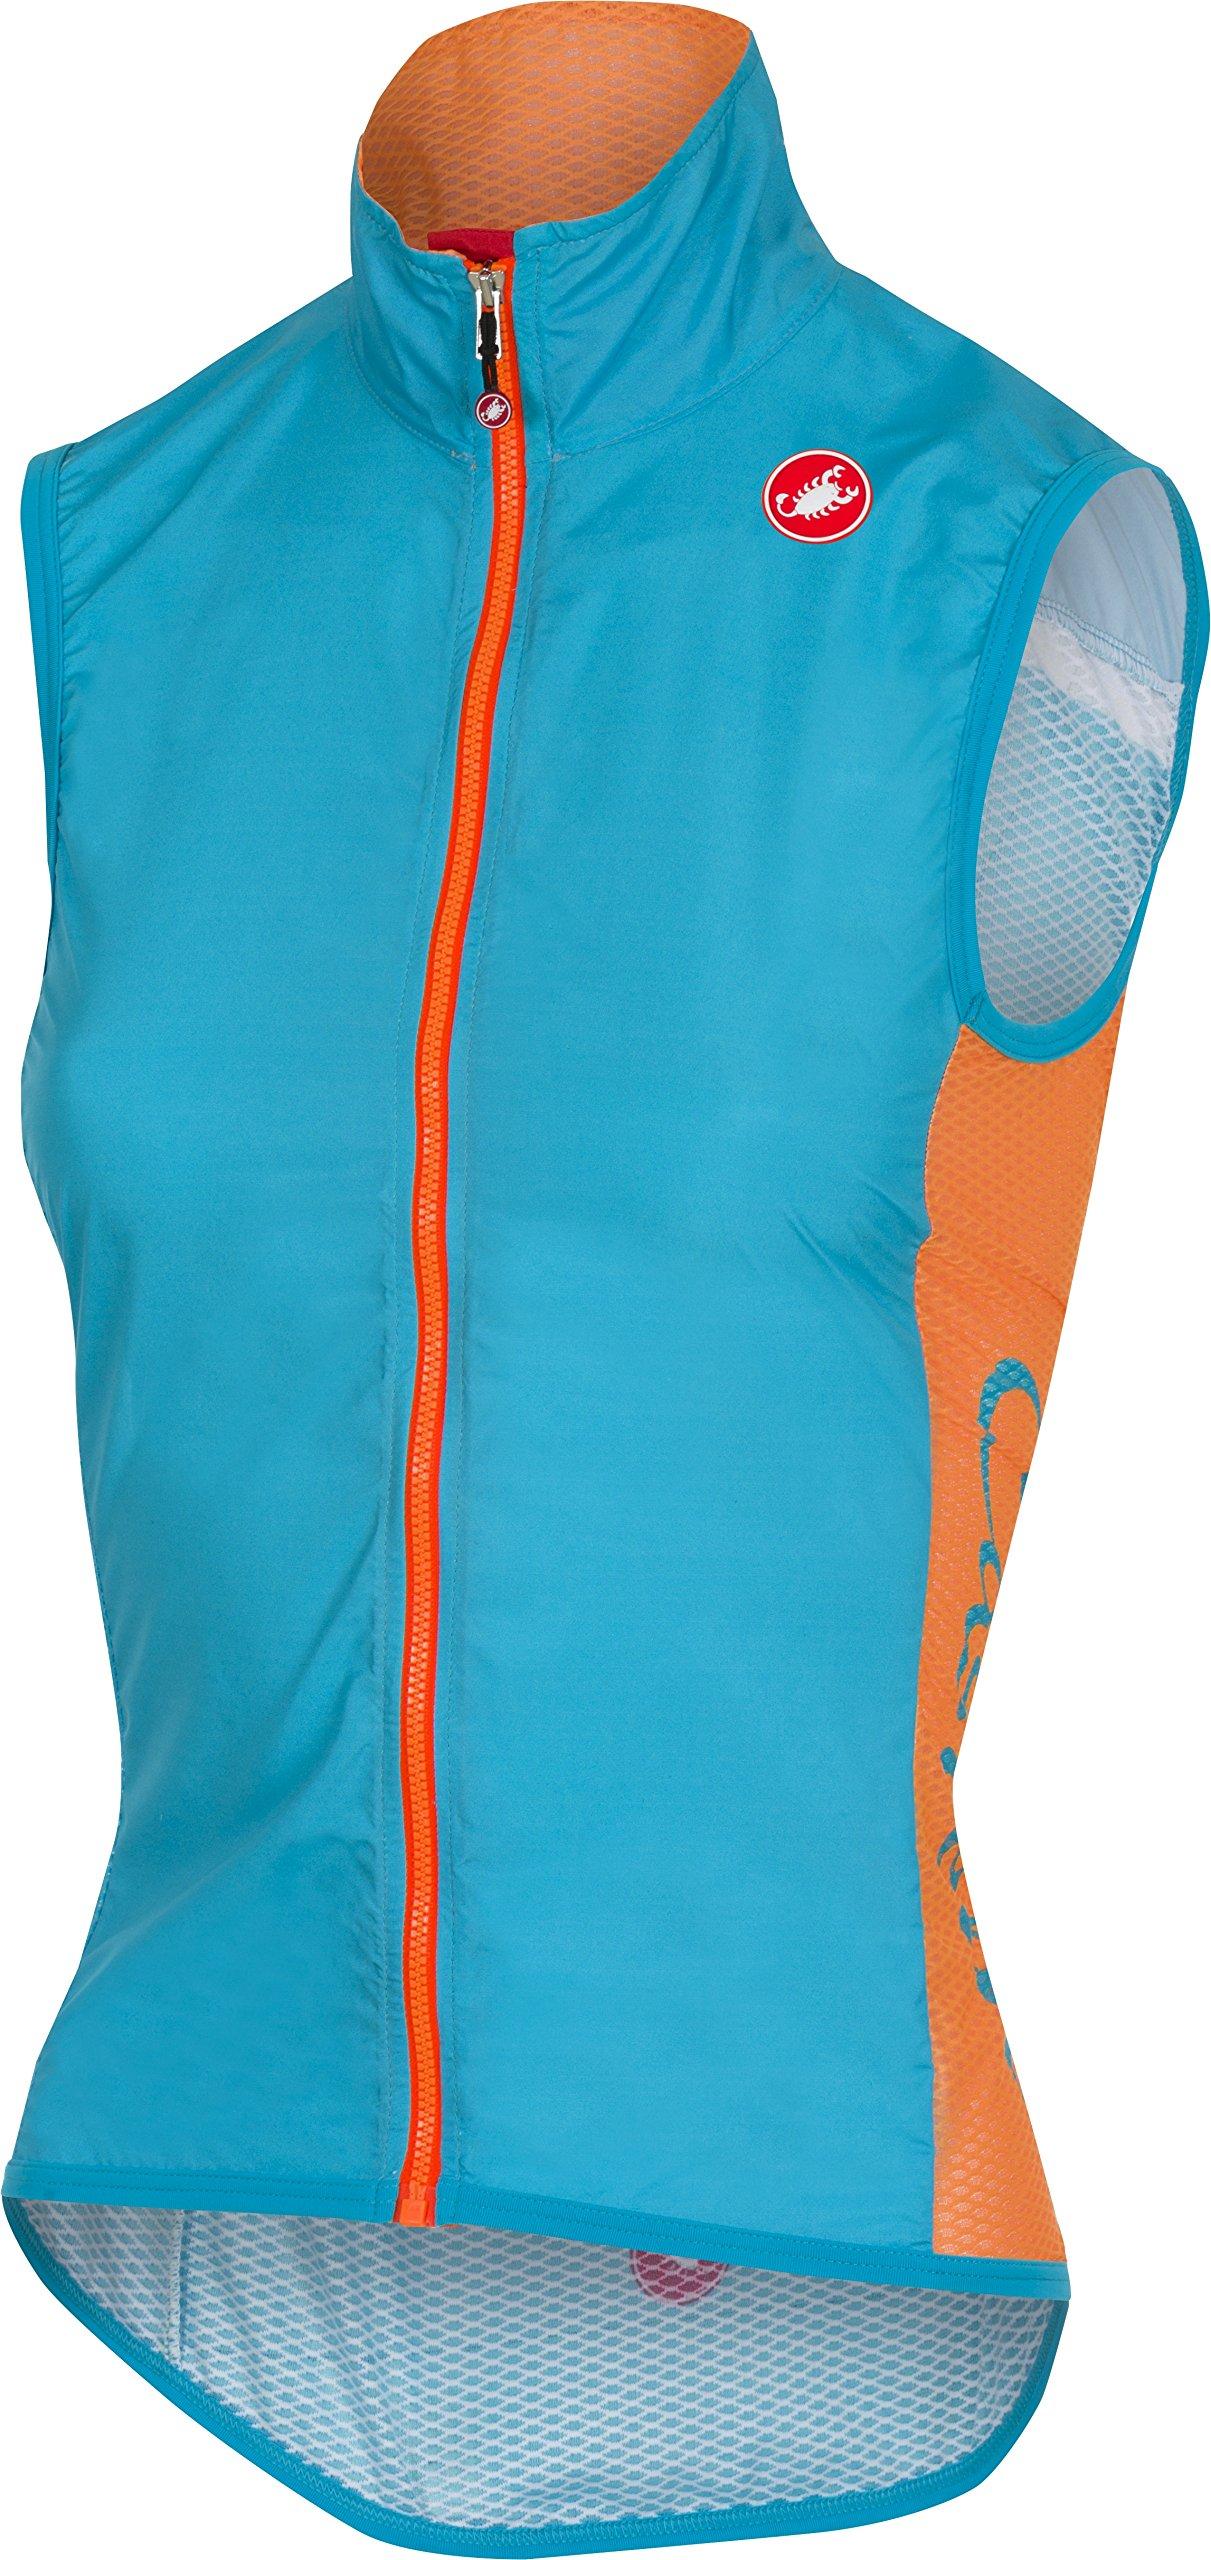 Castelli Pro Light Wind Vest - Women's Sky Blue, XL